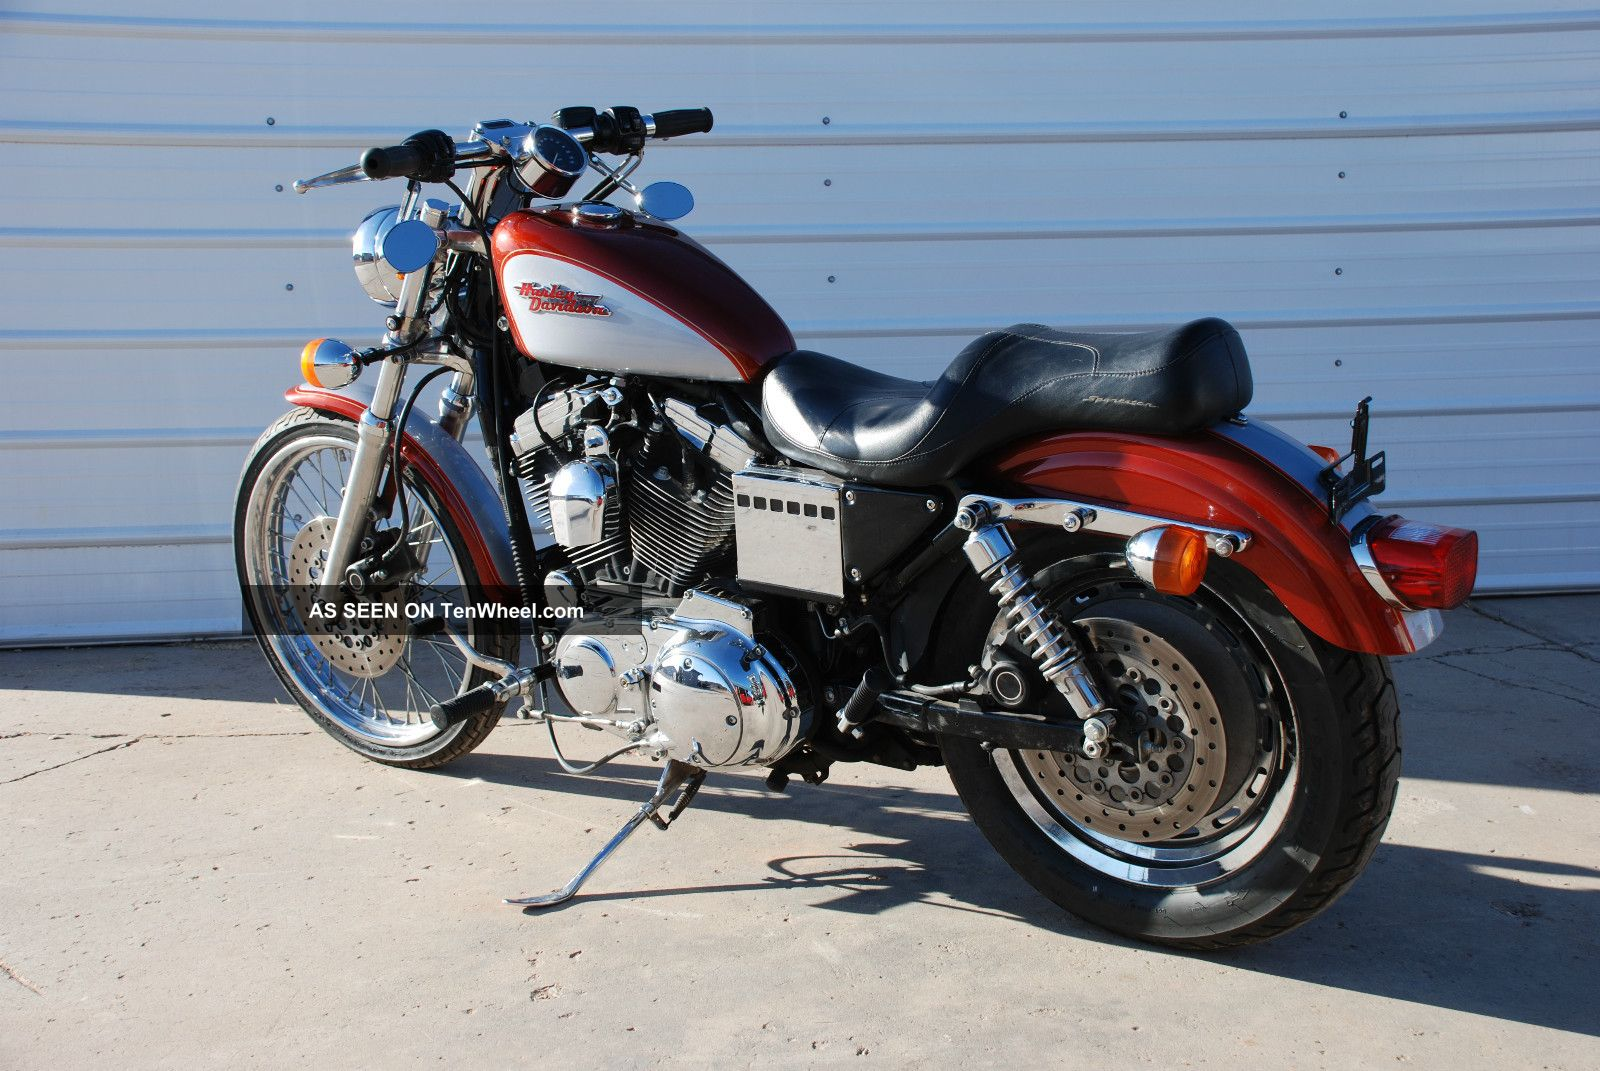 Harley Davidson Xlc Specs